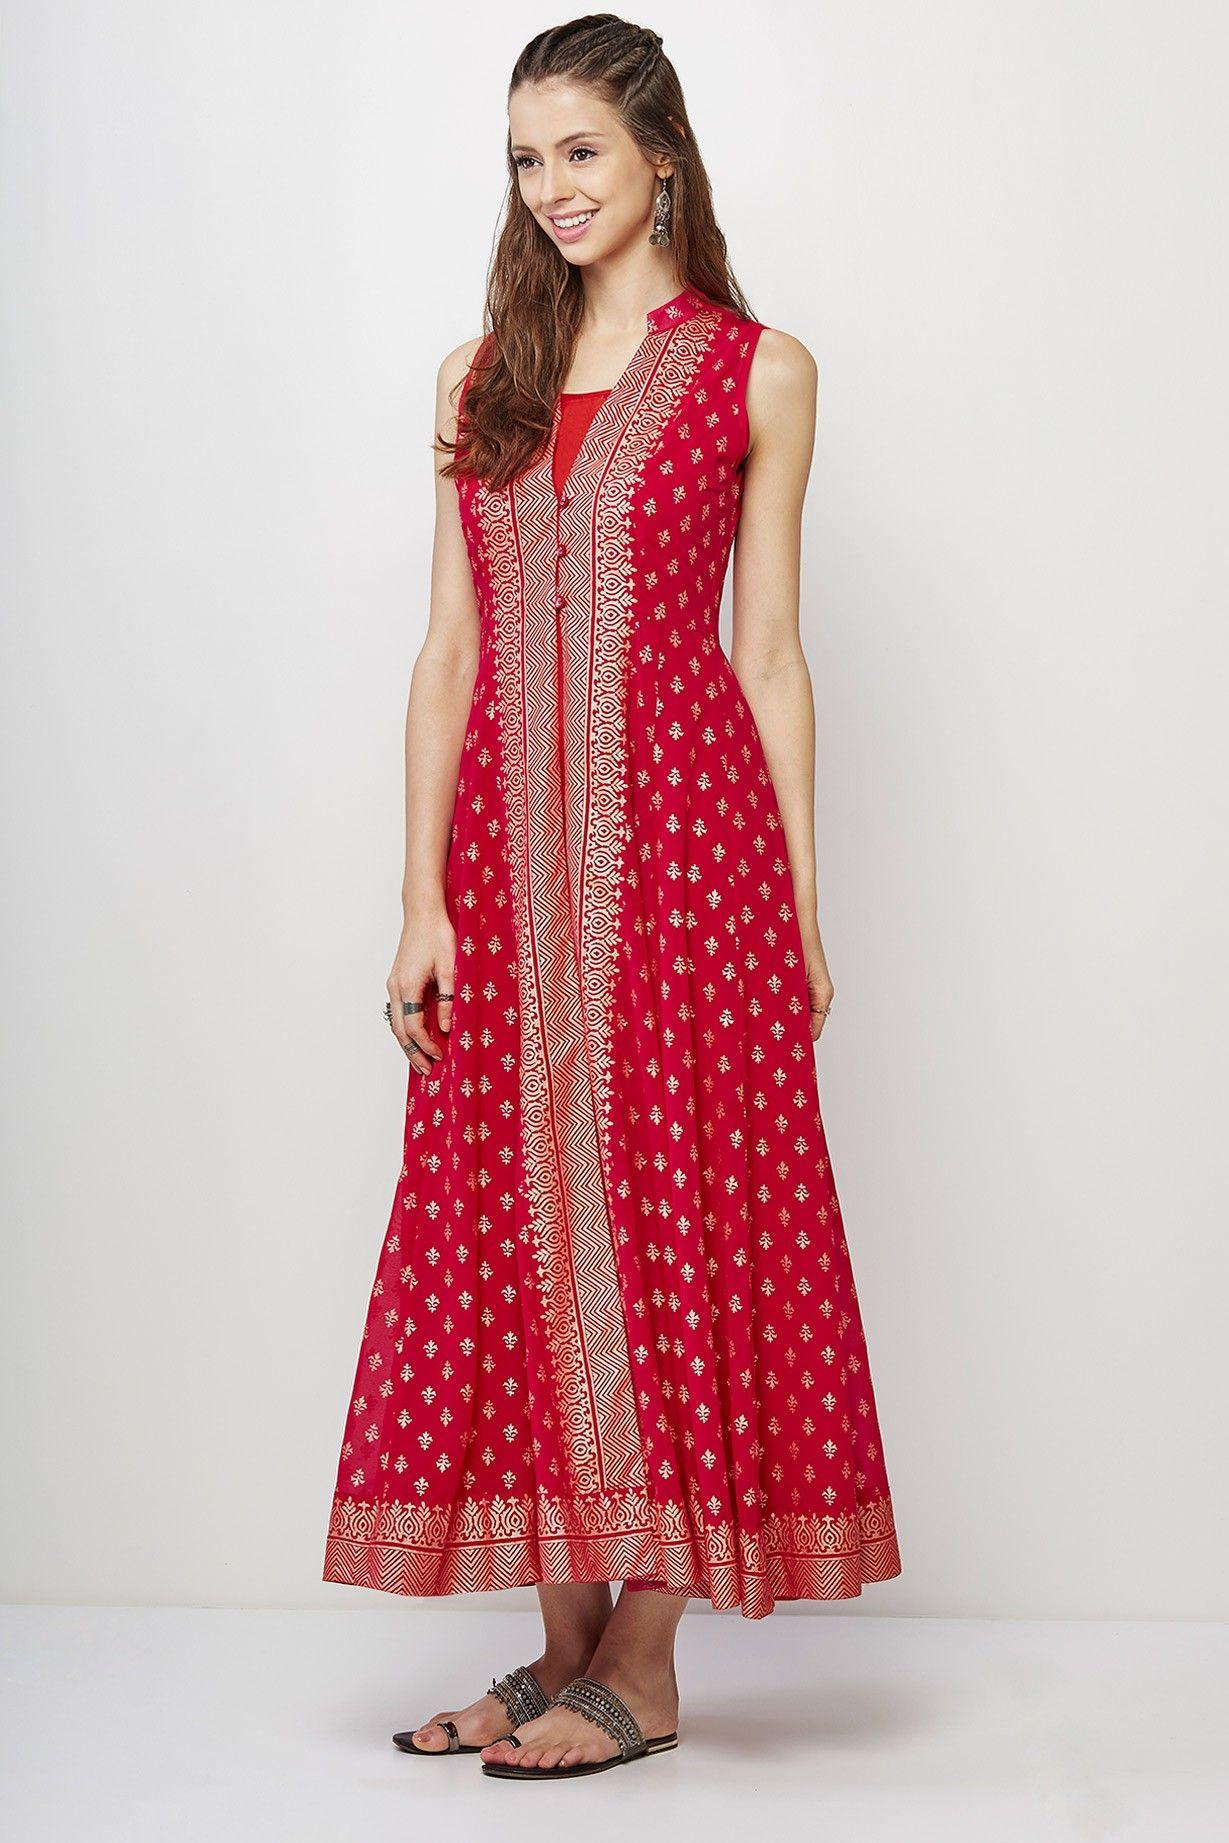 cd34e1d49c3 Kirra Coordinates - Buy Kirra Coordinates - AW16110142P180- Suit for Women  - Global Desi by Anita Dongre